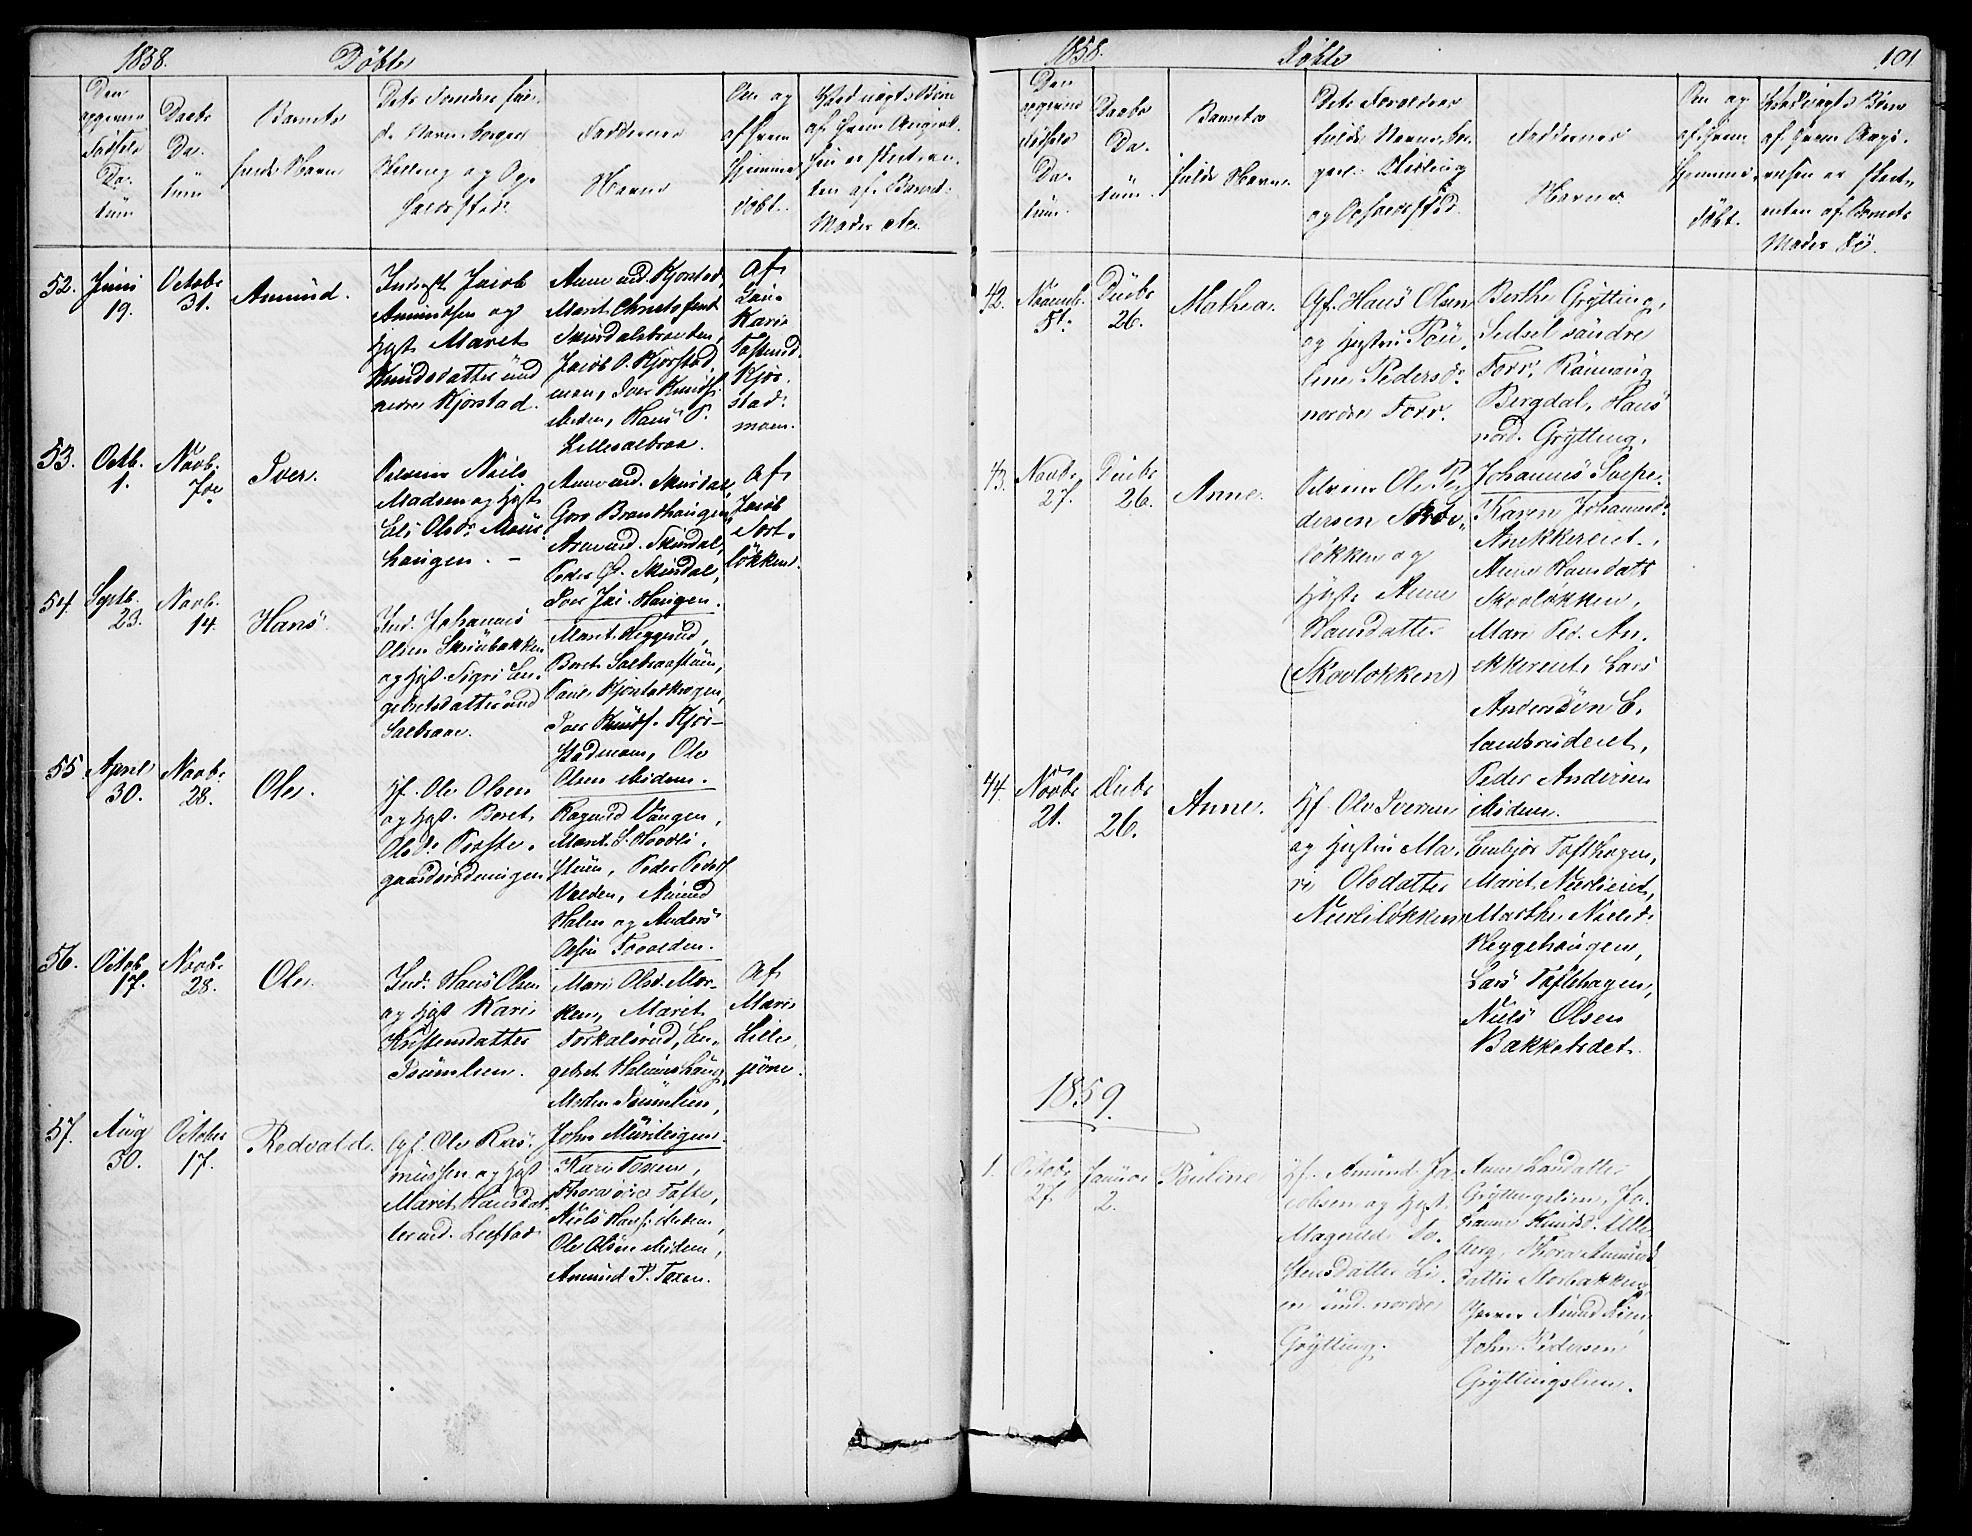 SAH, Sør-Fron prestekontor, H/Ha/Hab/L0001: Klokkerbok nr. 1, 1844-1863, s. 101